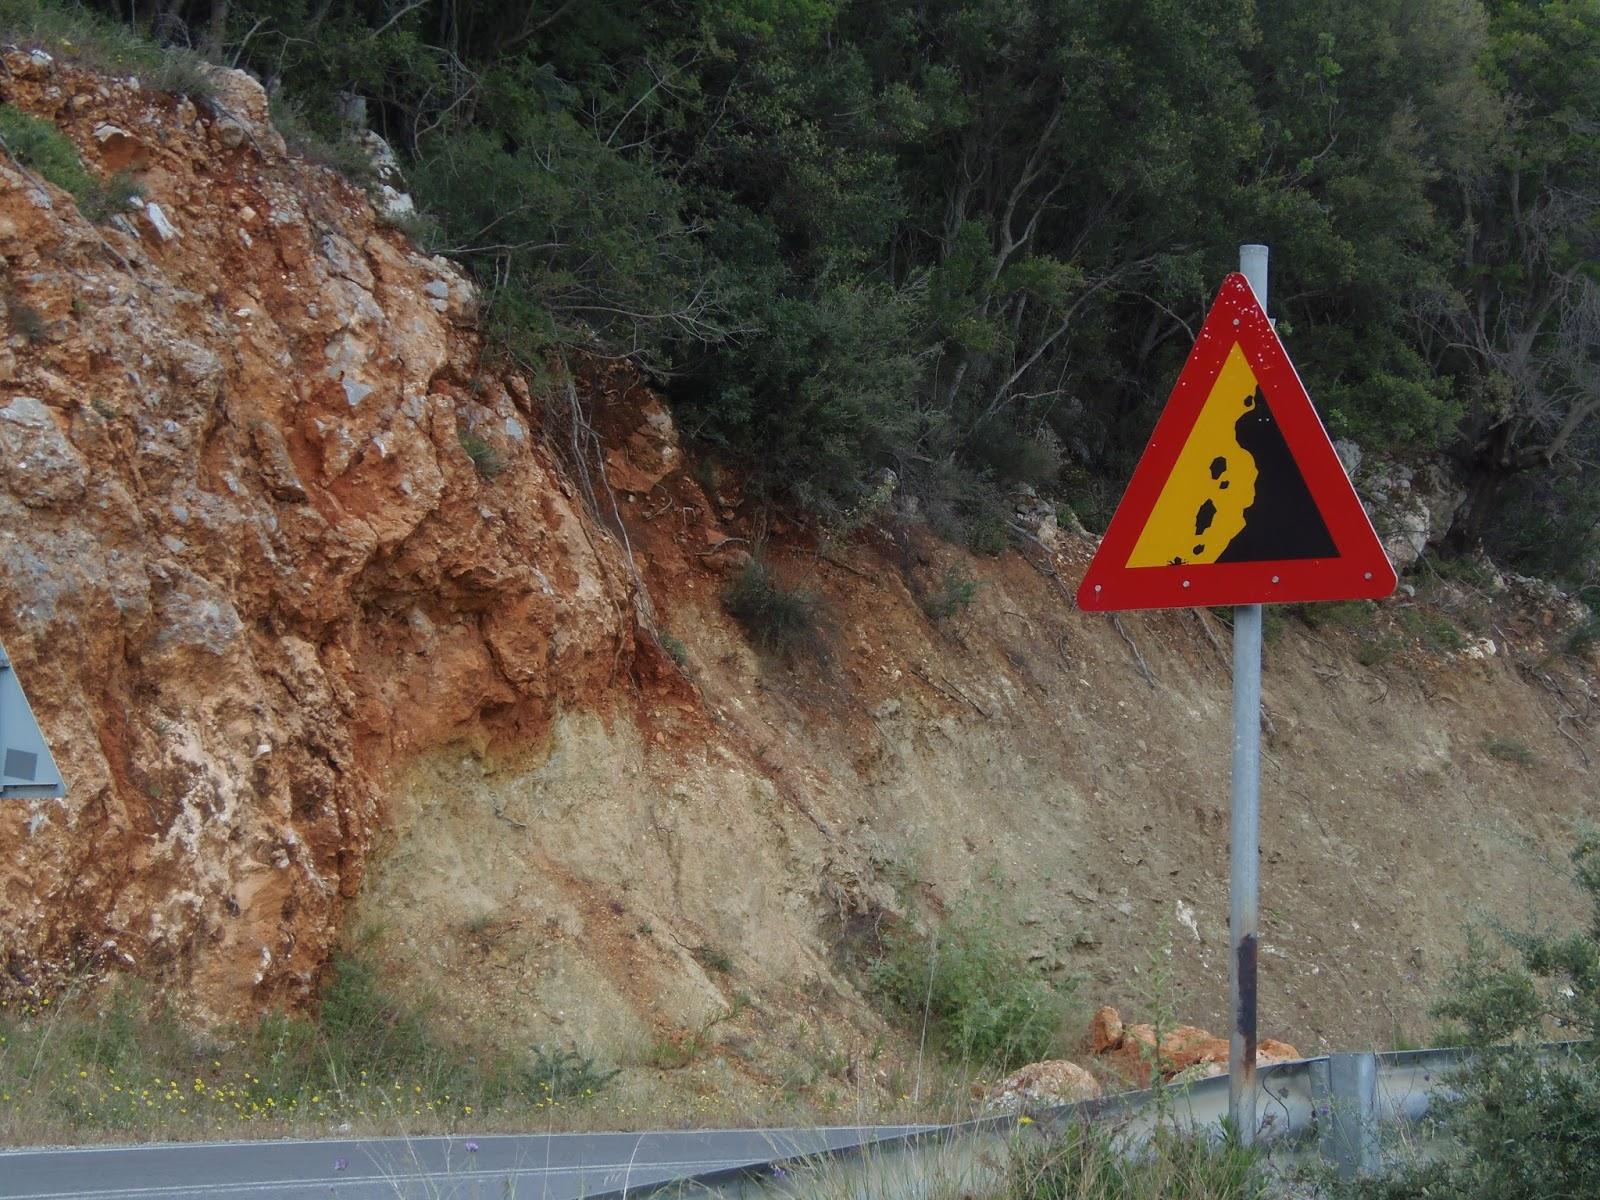 jeep safari, road sign, cliffs, mountain, travel, traveling